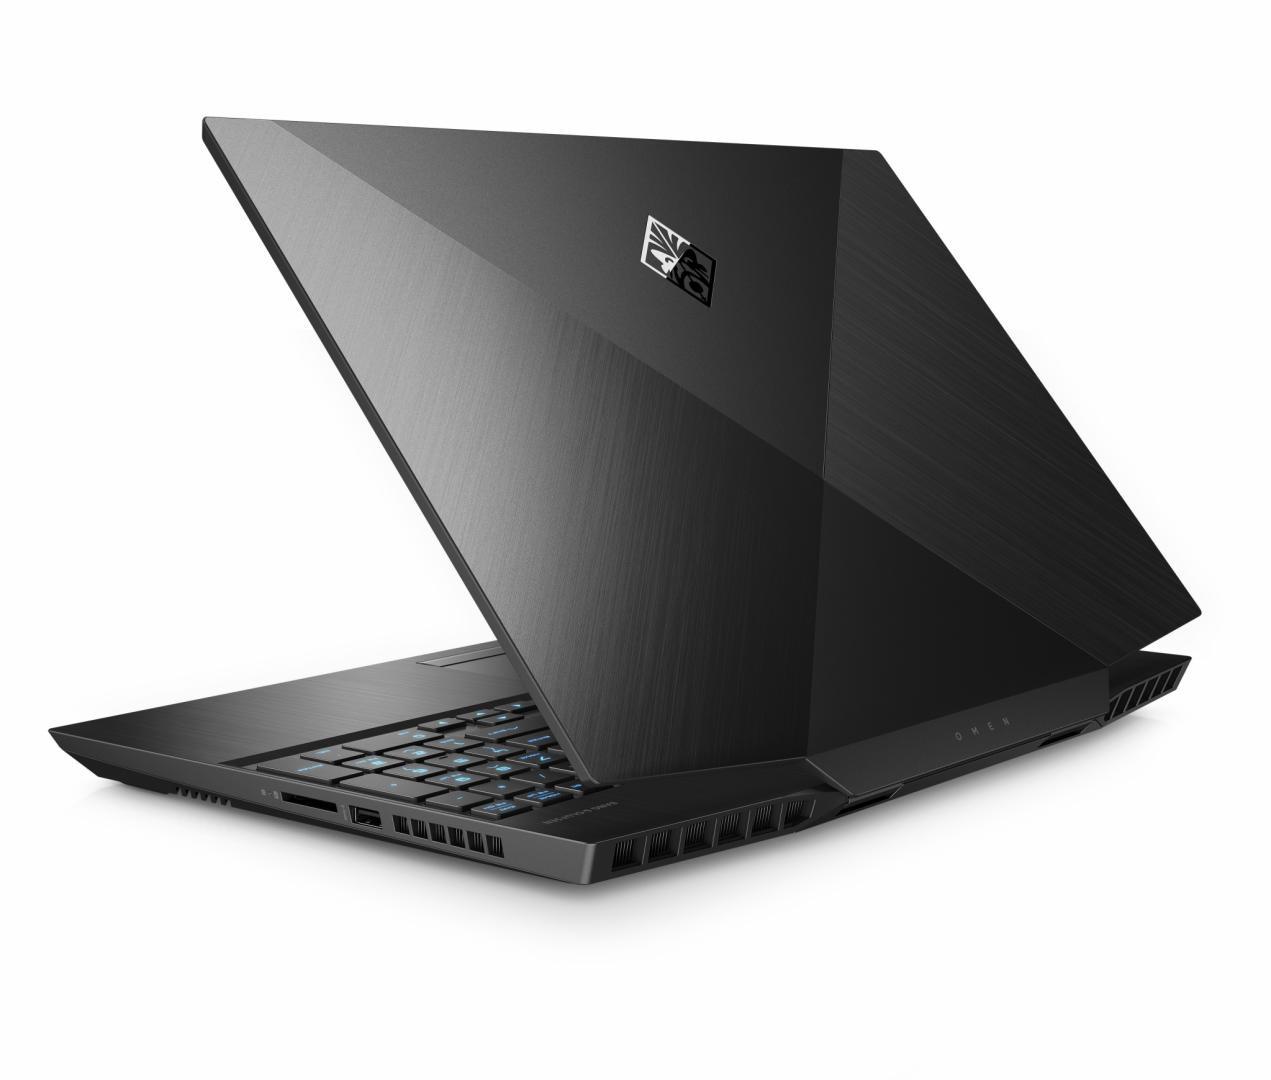 "NOTEBOOK HP OMEN 15.6"" FHD i7-10750H 8GB 512GB 6GB-GTX1660Ti DOS   15-ek0000nq - imaginea 3"